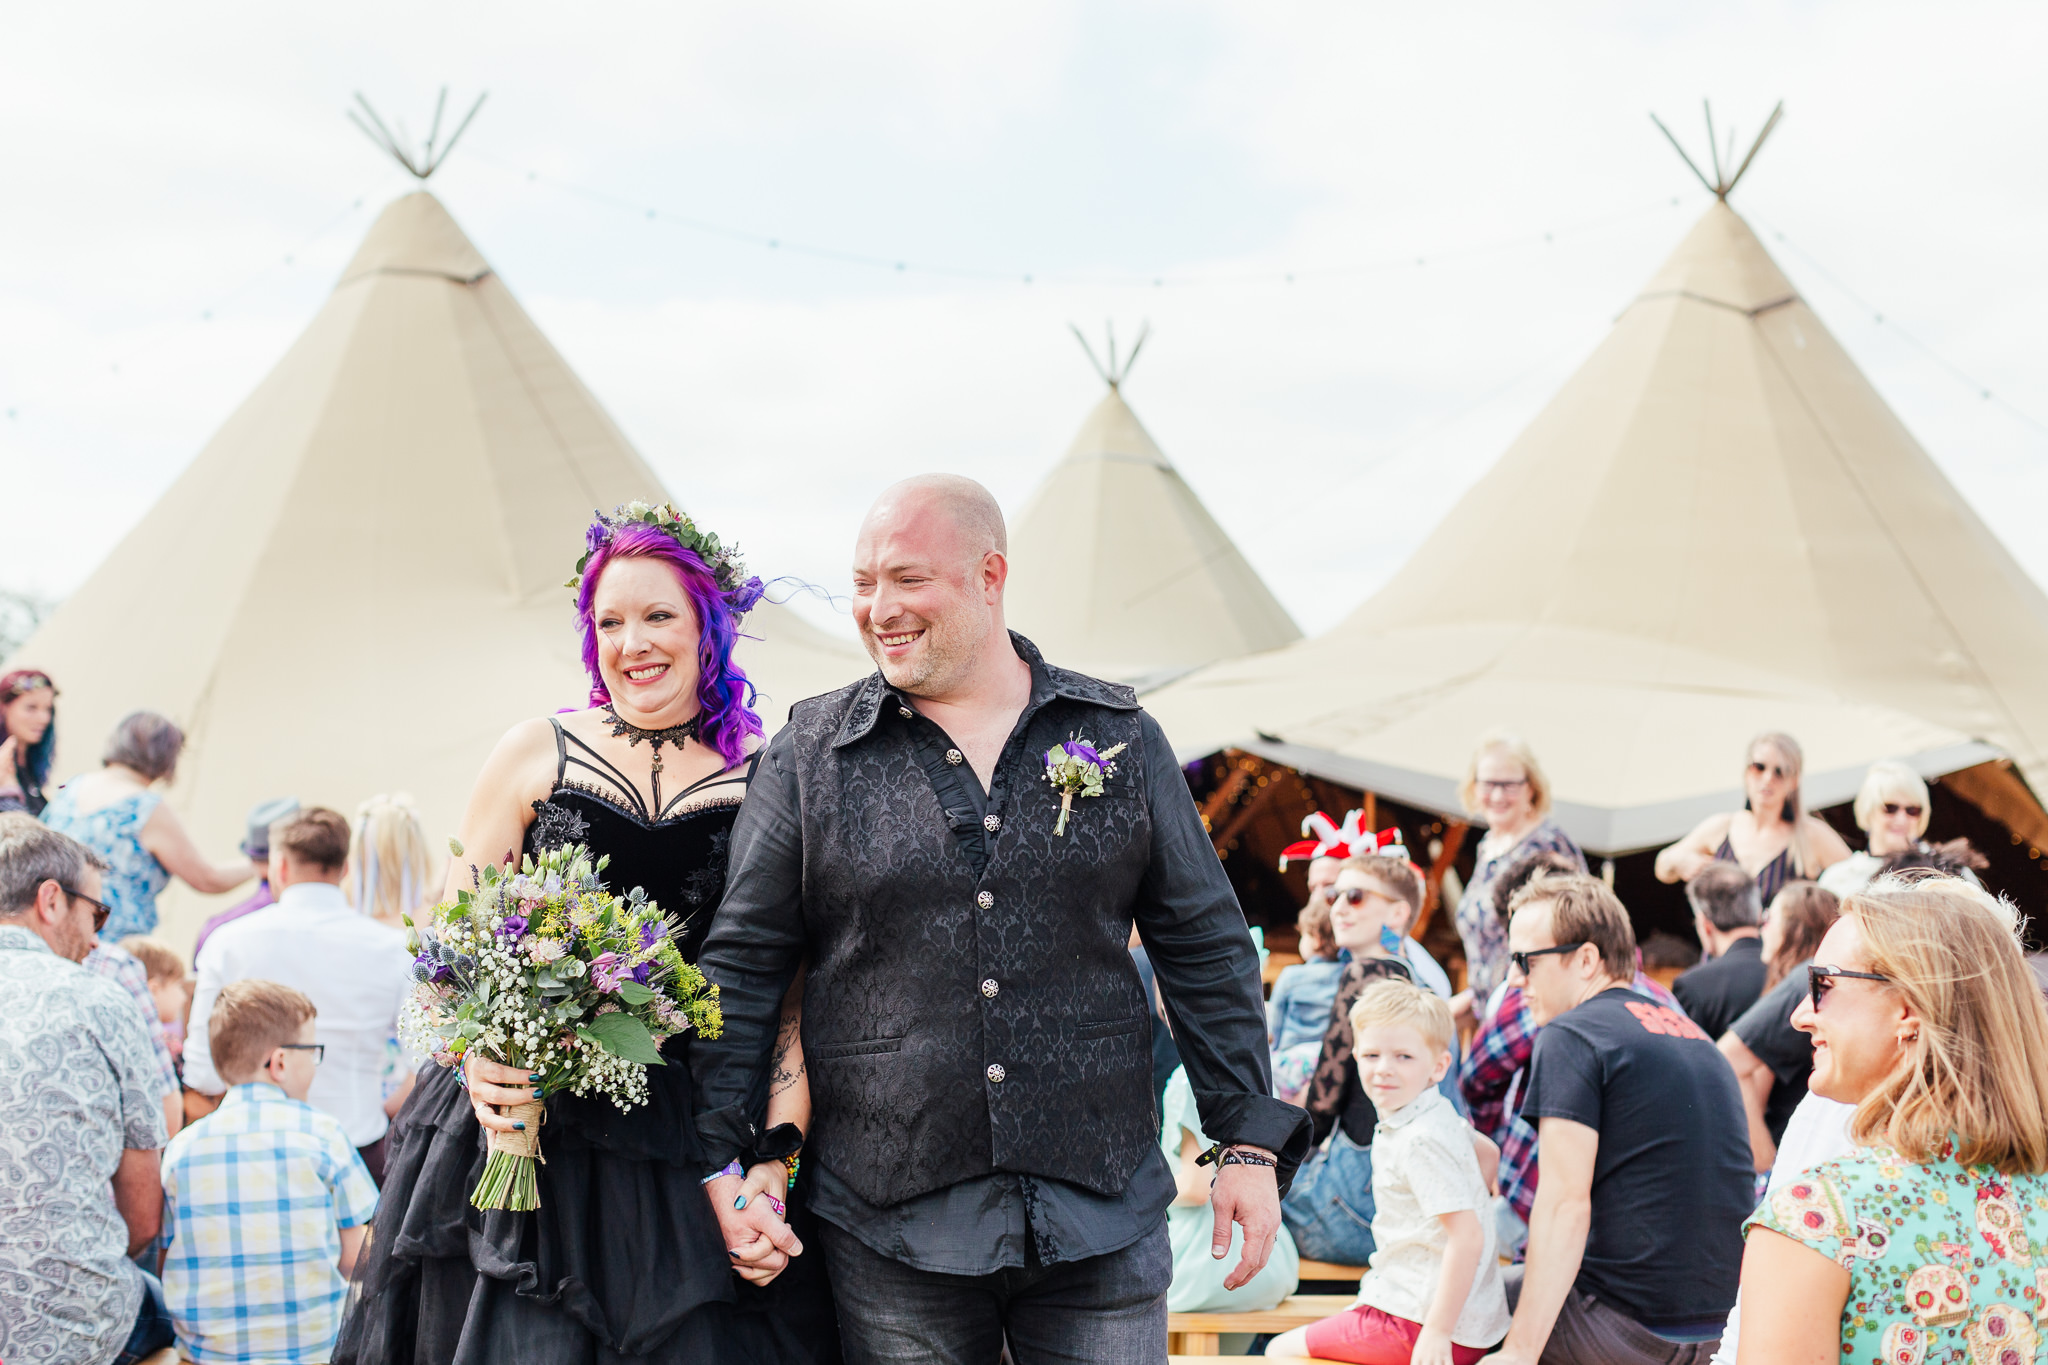 Inkersall-grange-farm-wedding-22.jpg